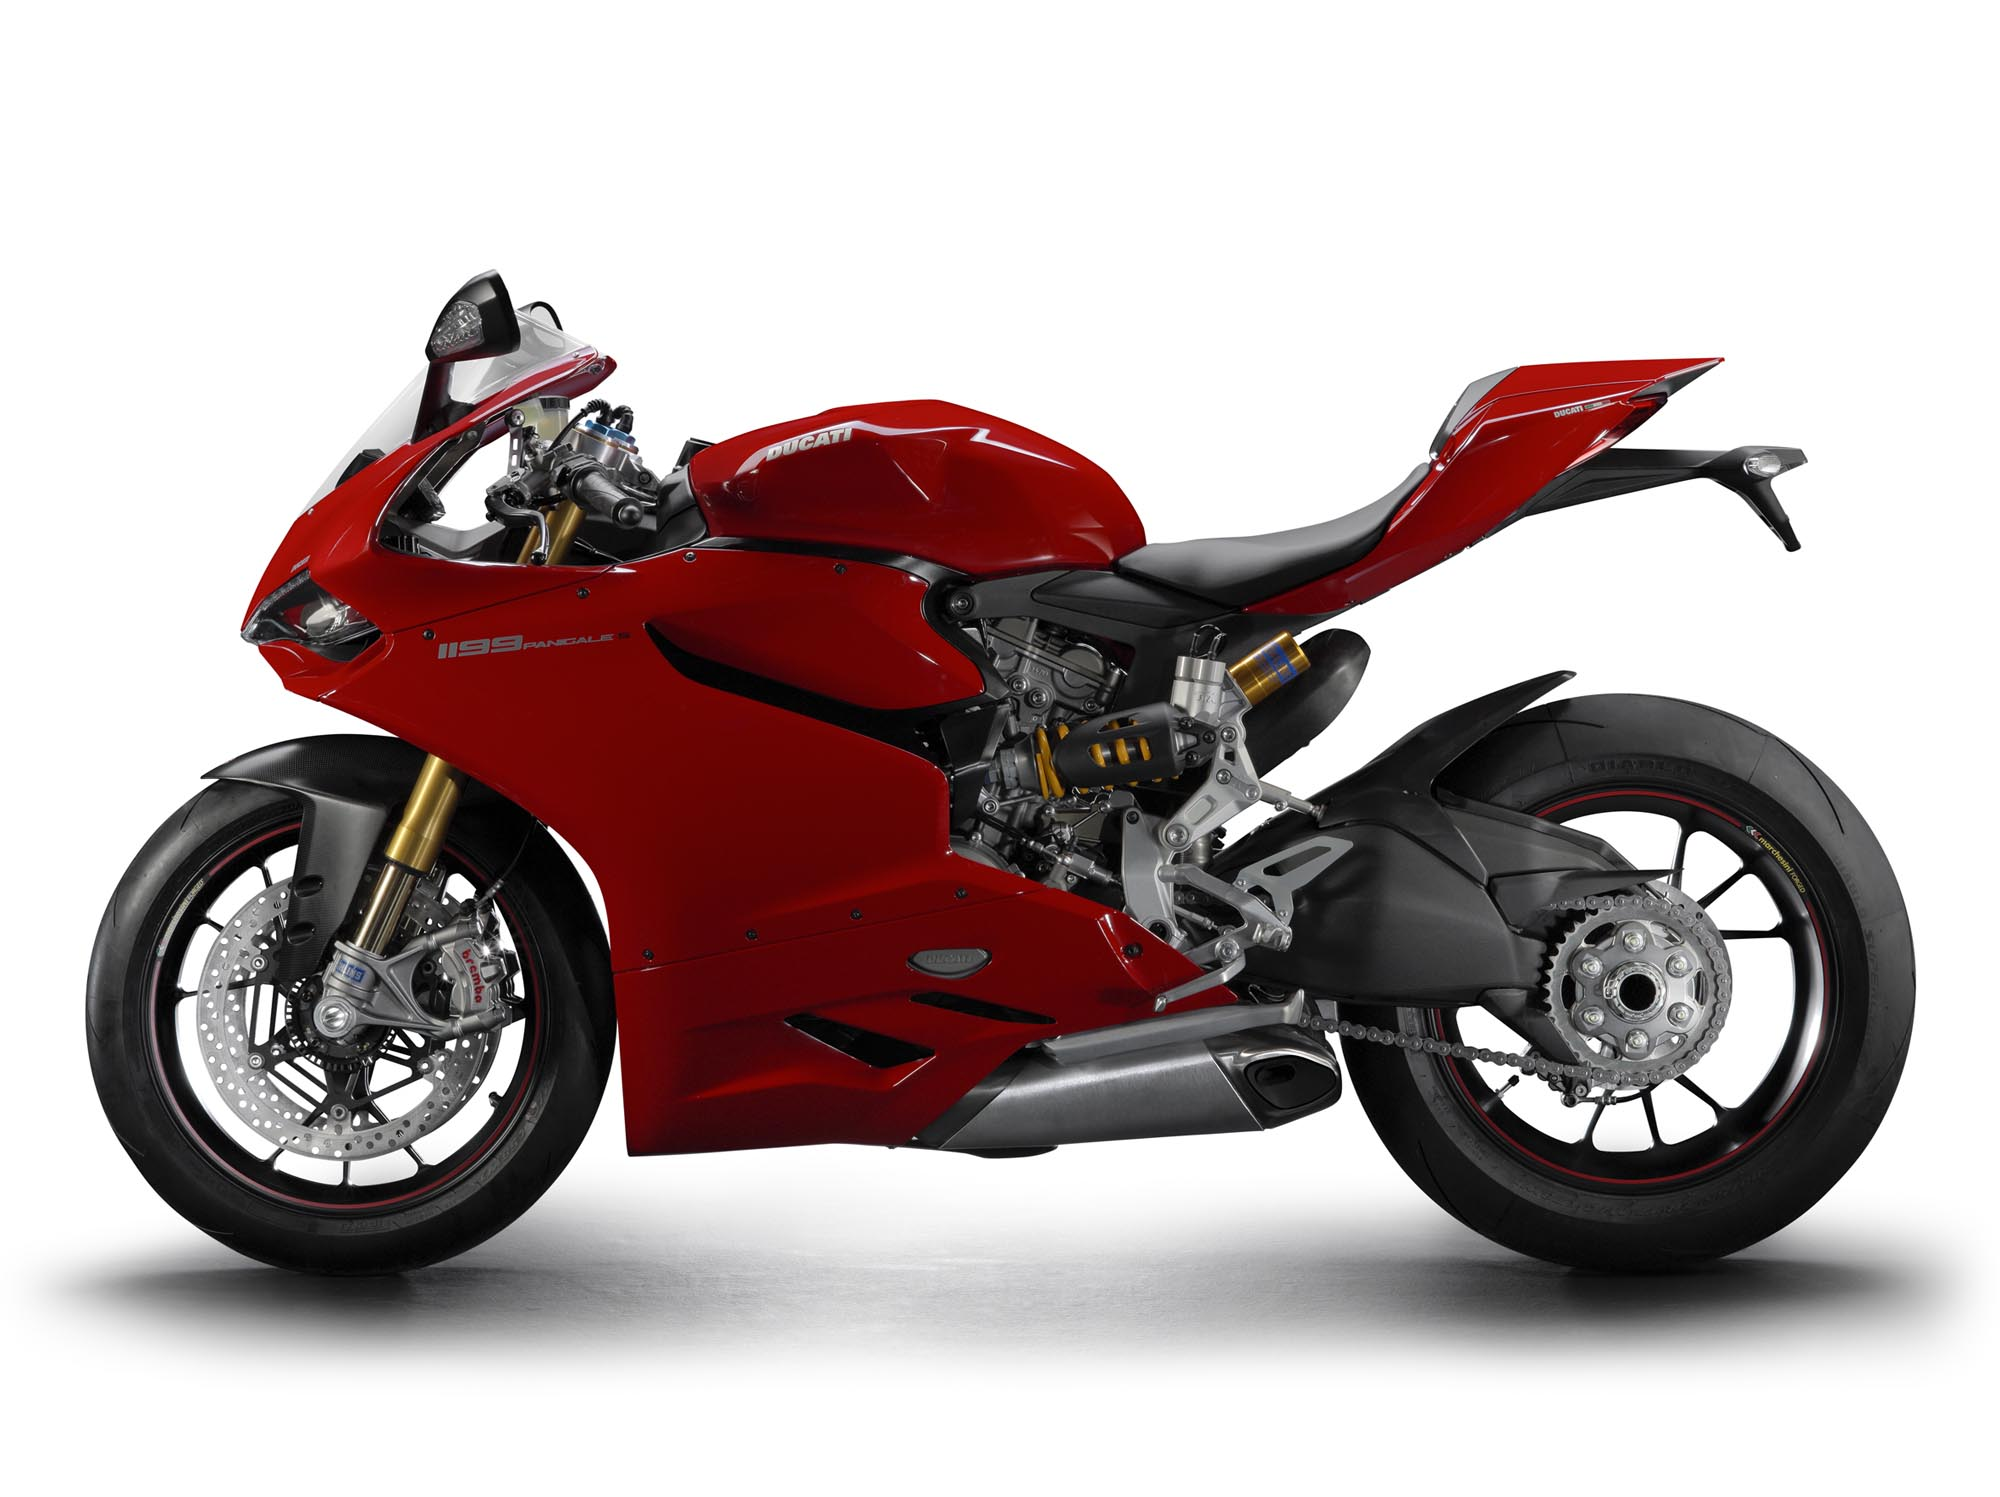 2012 Ducati 1199 Panigale Redefines the Word 'Superbike' - Asphalt ...